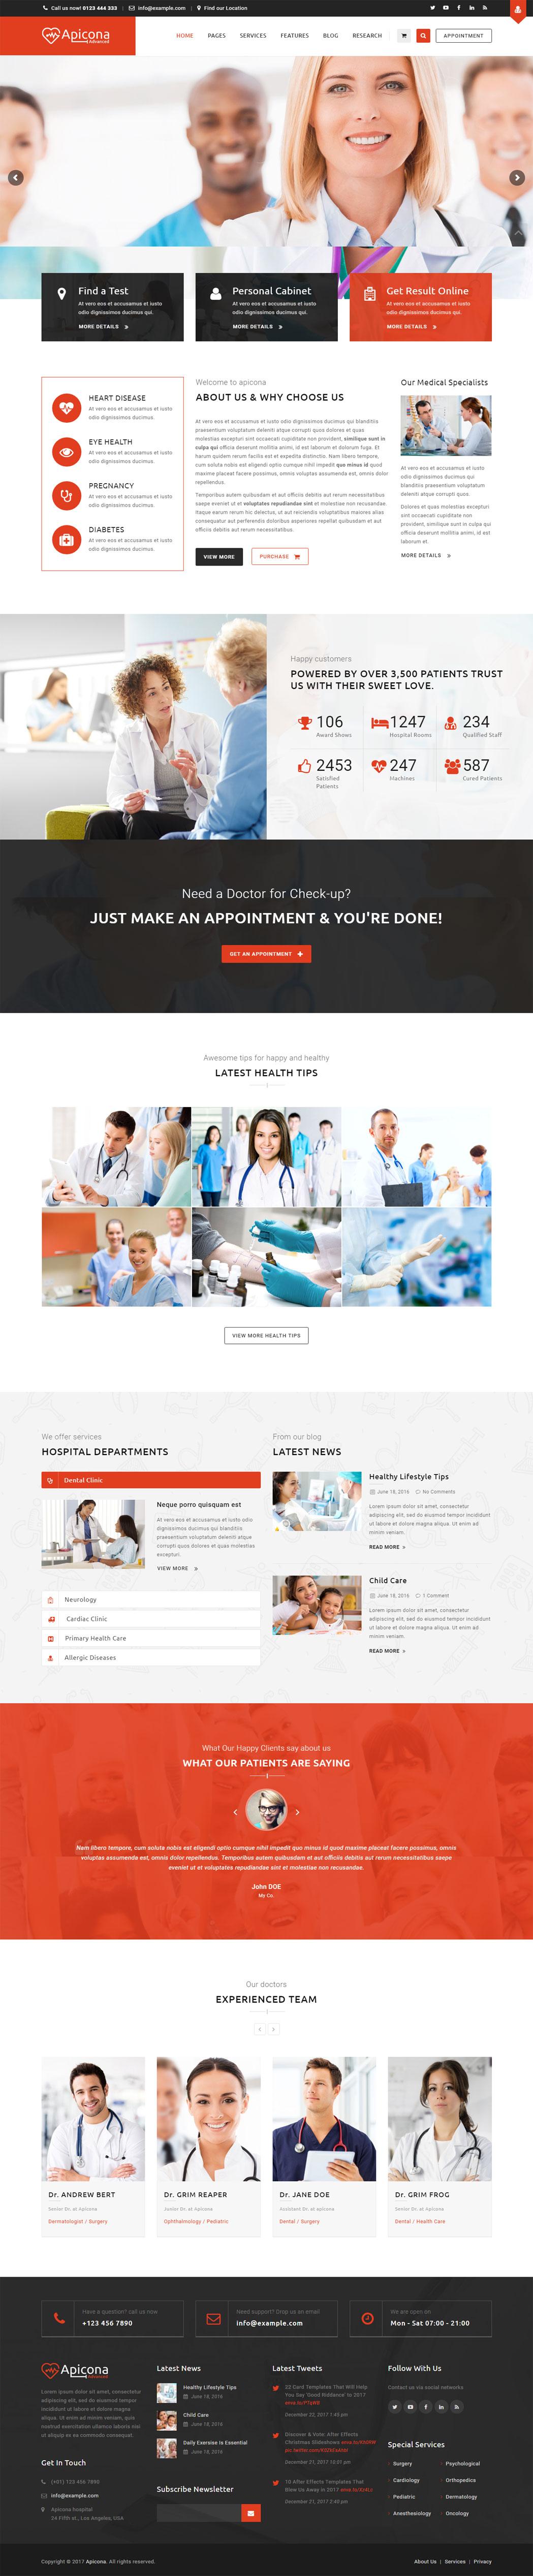 Apicona 14.1.0 медицинская тема для wordpress